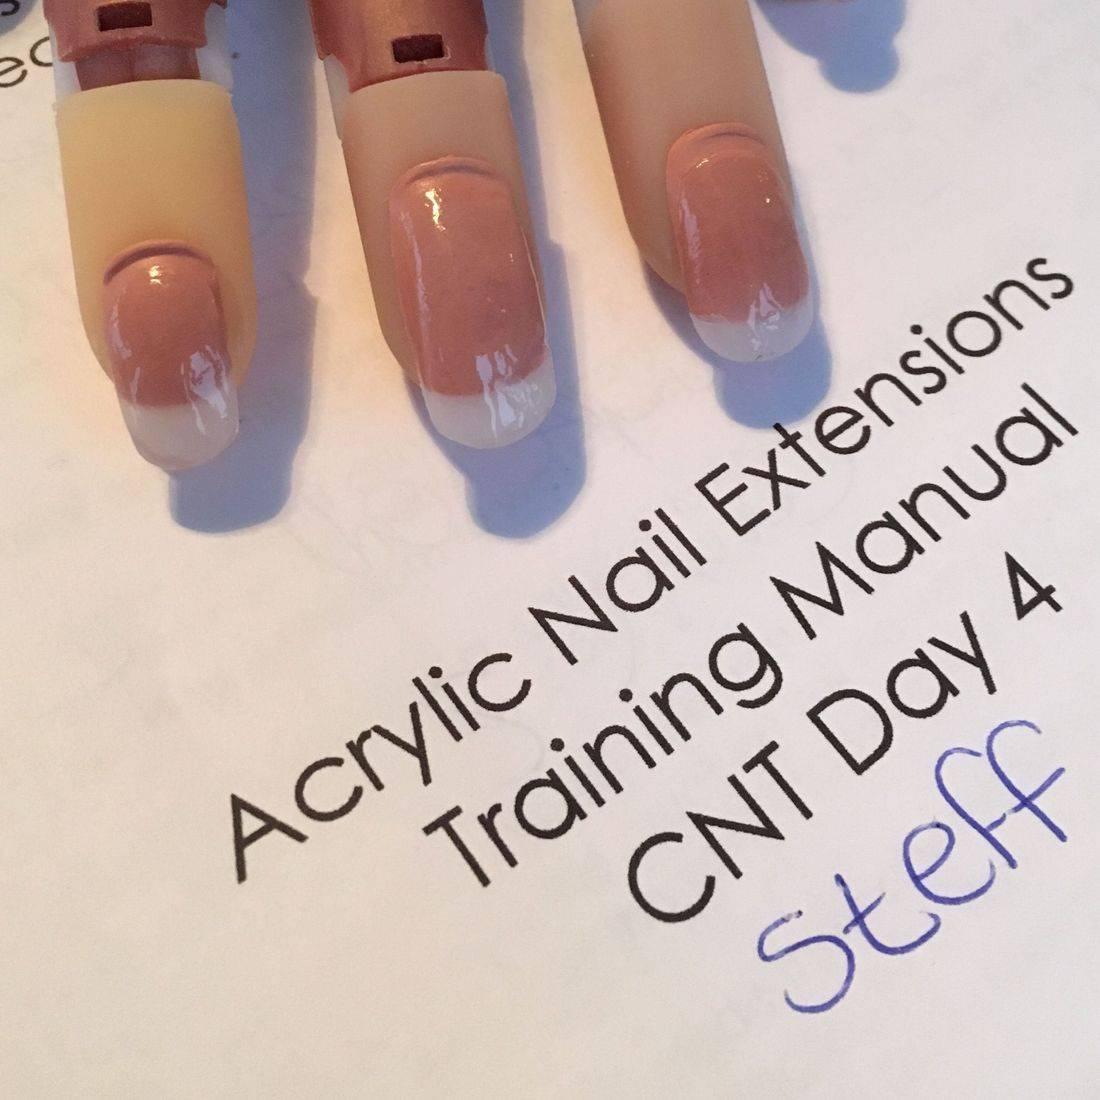 Complete Nail Technician Course course